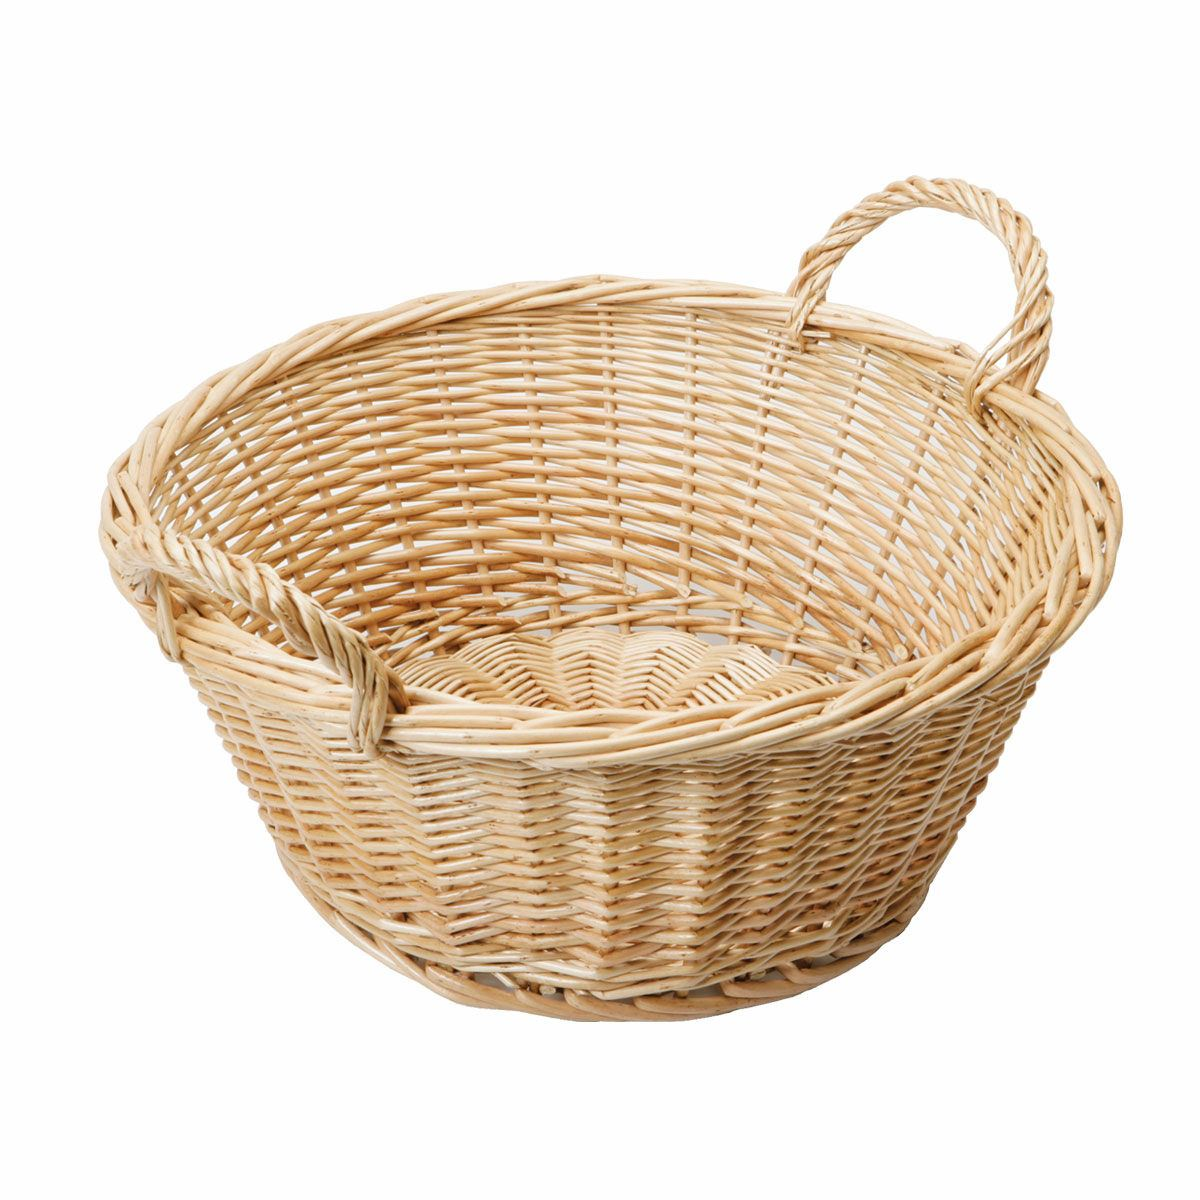 Dongguan Beinuo Chicken Shaped Basket - Wicker Basket, Transparent background PNG HD thumbnail